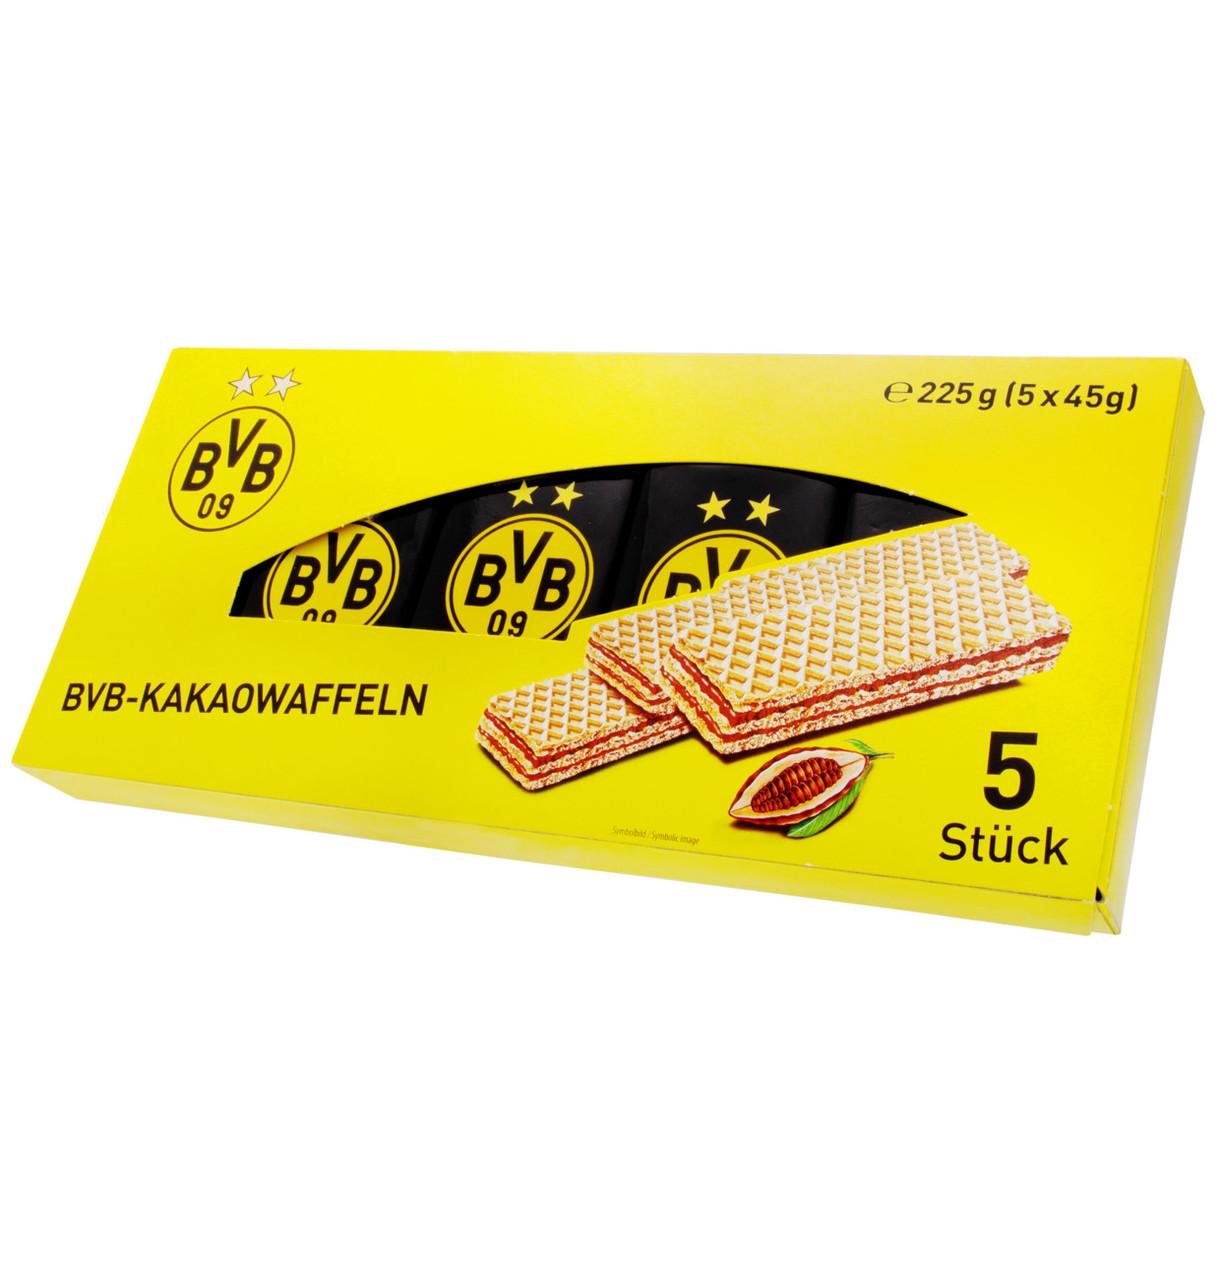 Вафлі BVB Wafers with chocolate cream (5х45г), з шок. кремом 225г, 14шт/ящ